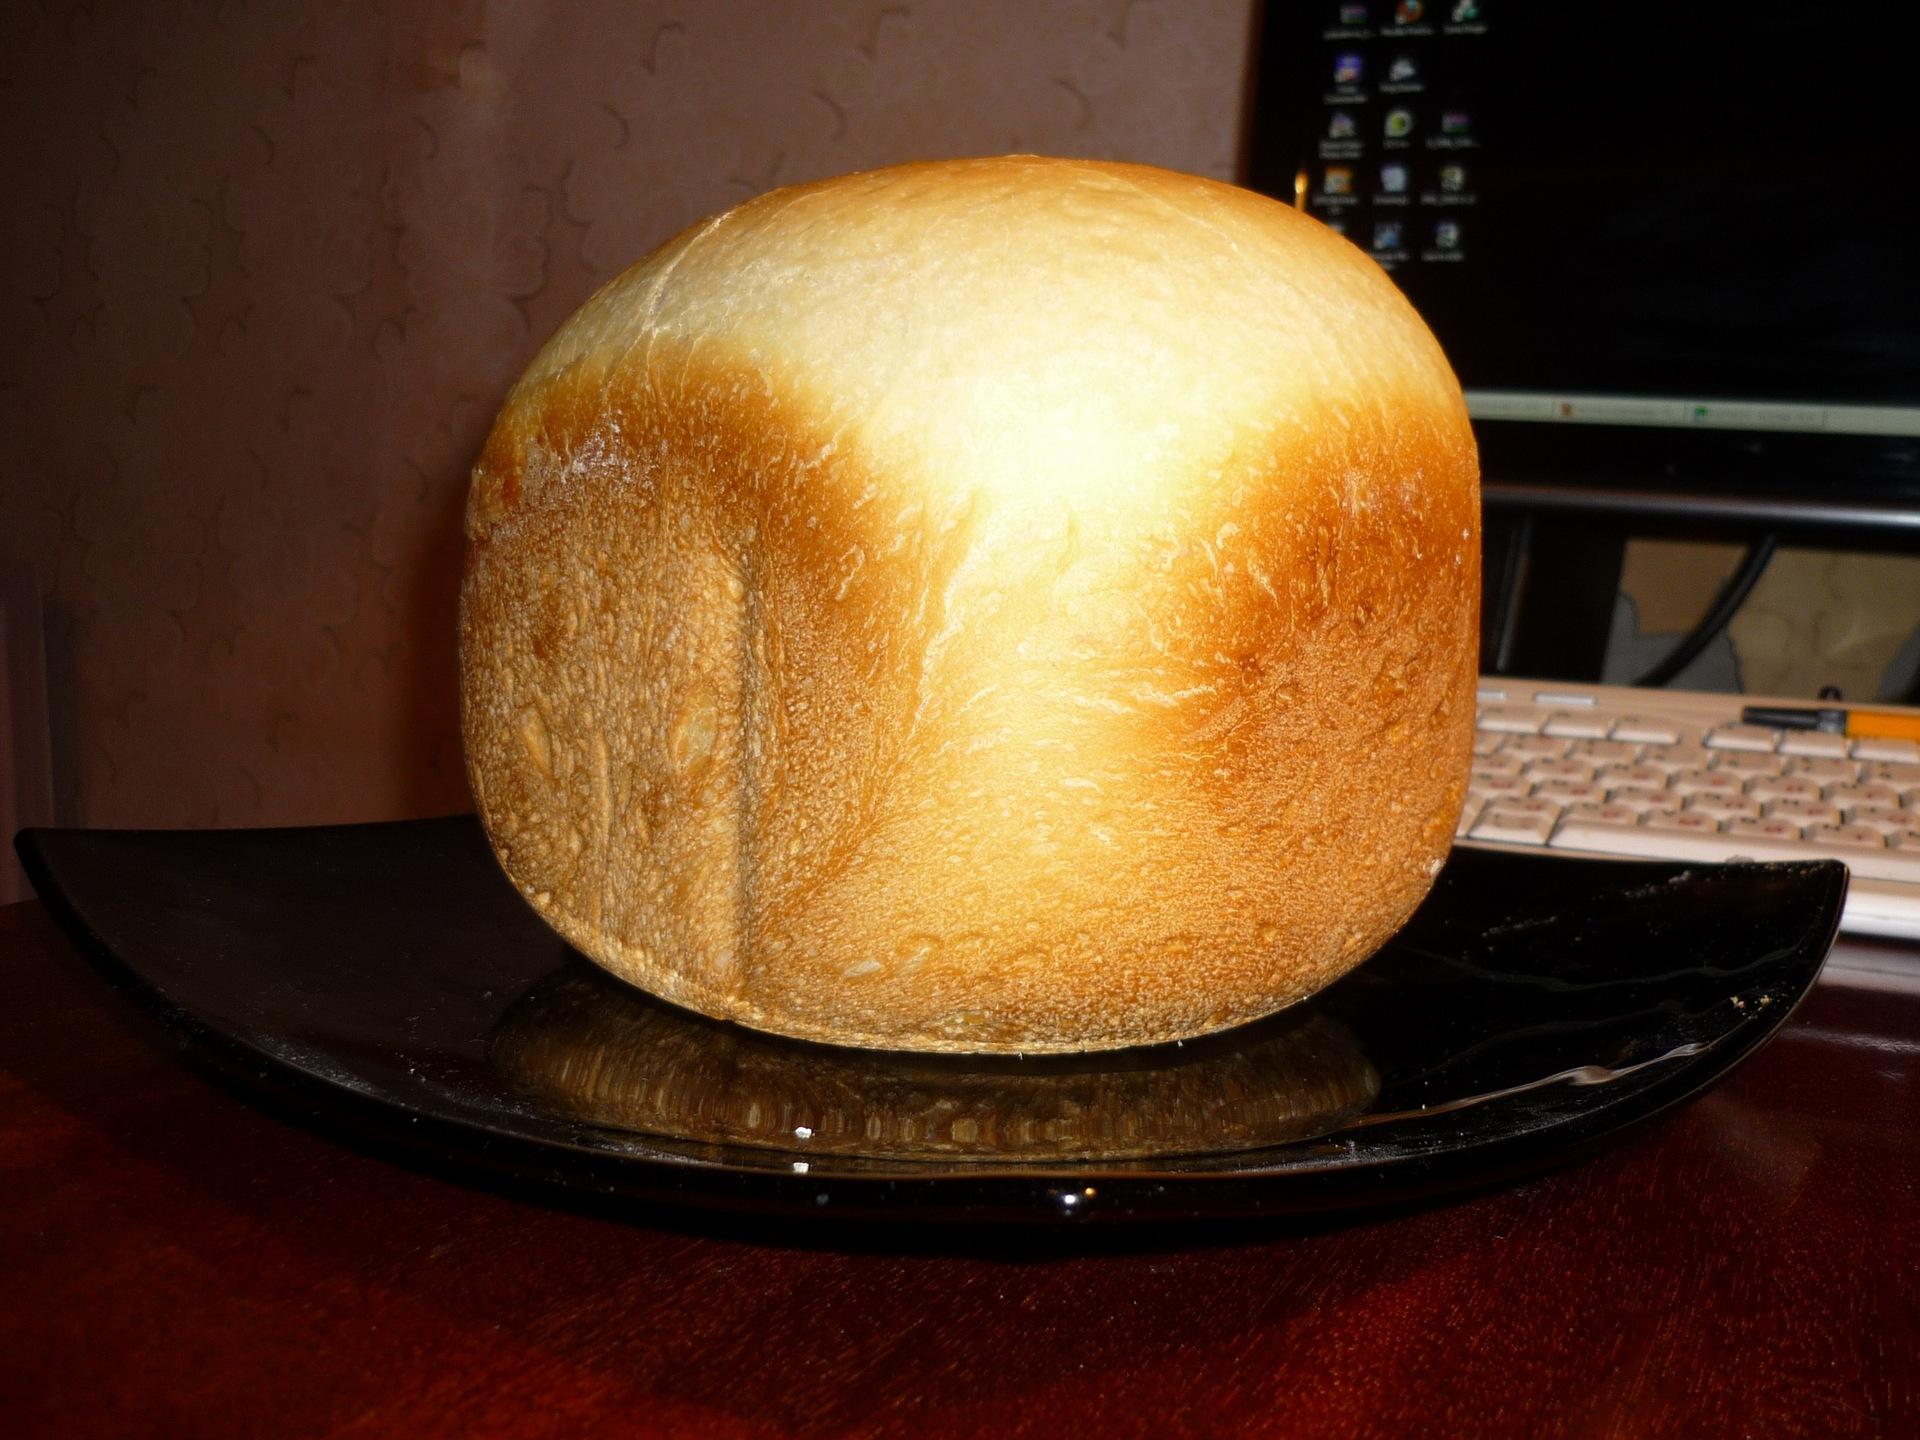 инструкция и рецепты к хлебопечи кенвуд вм 210